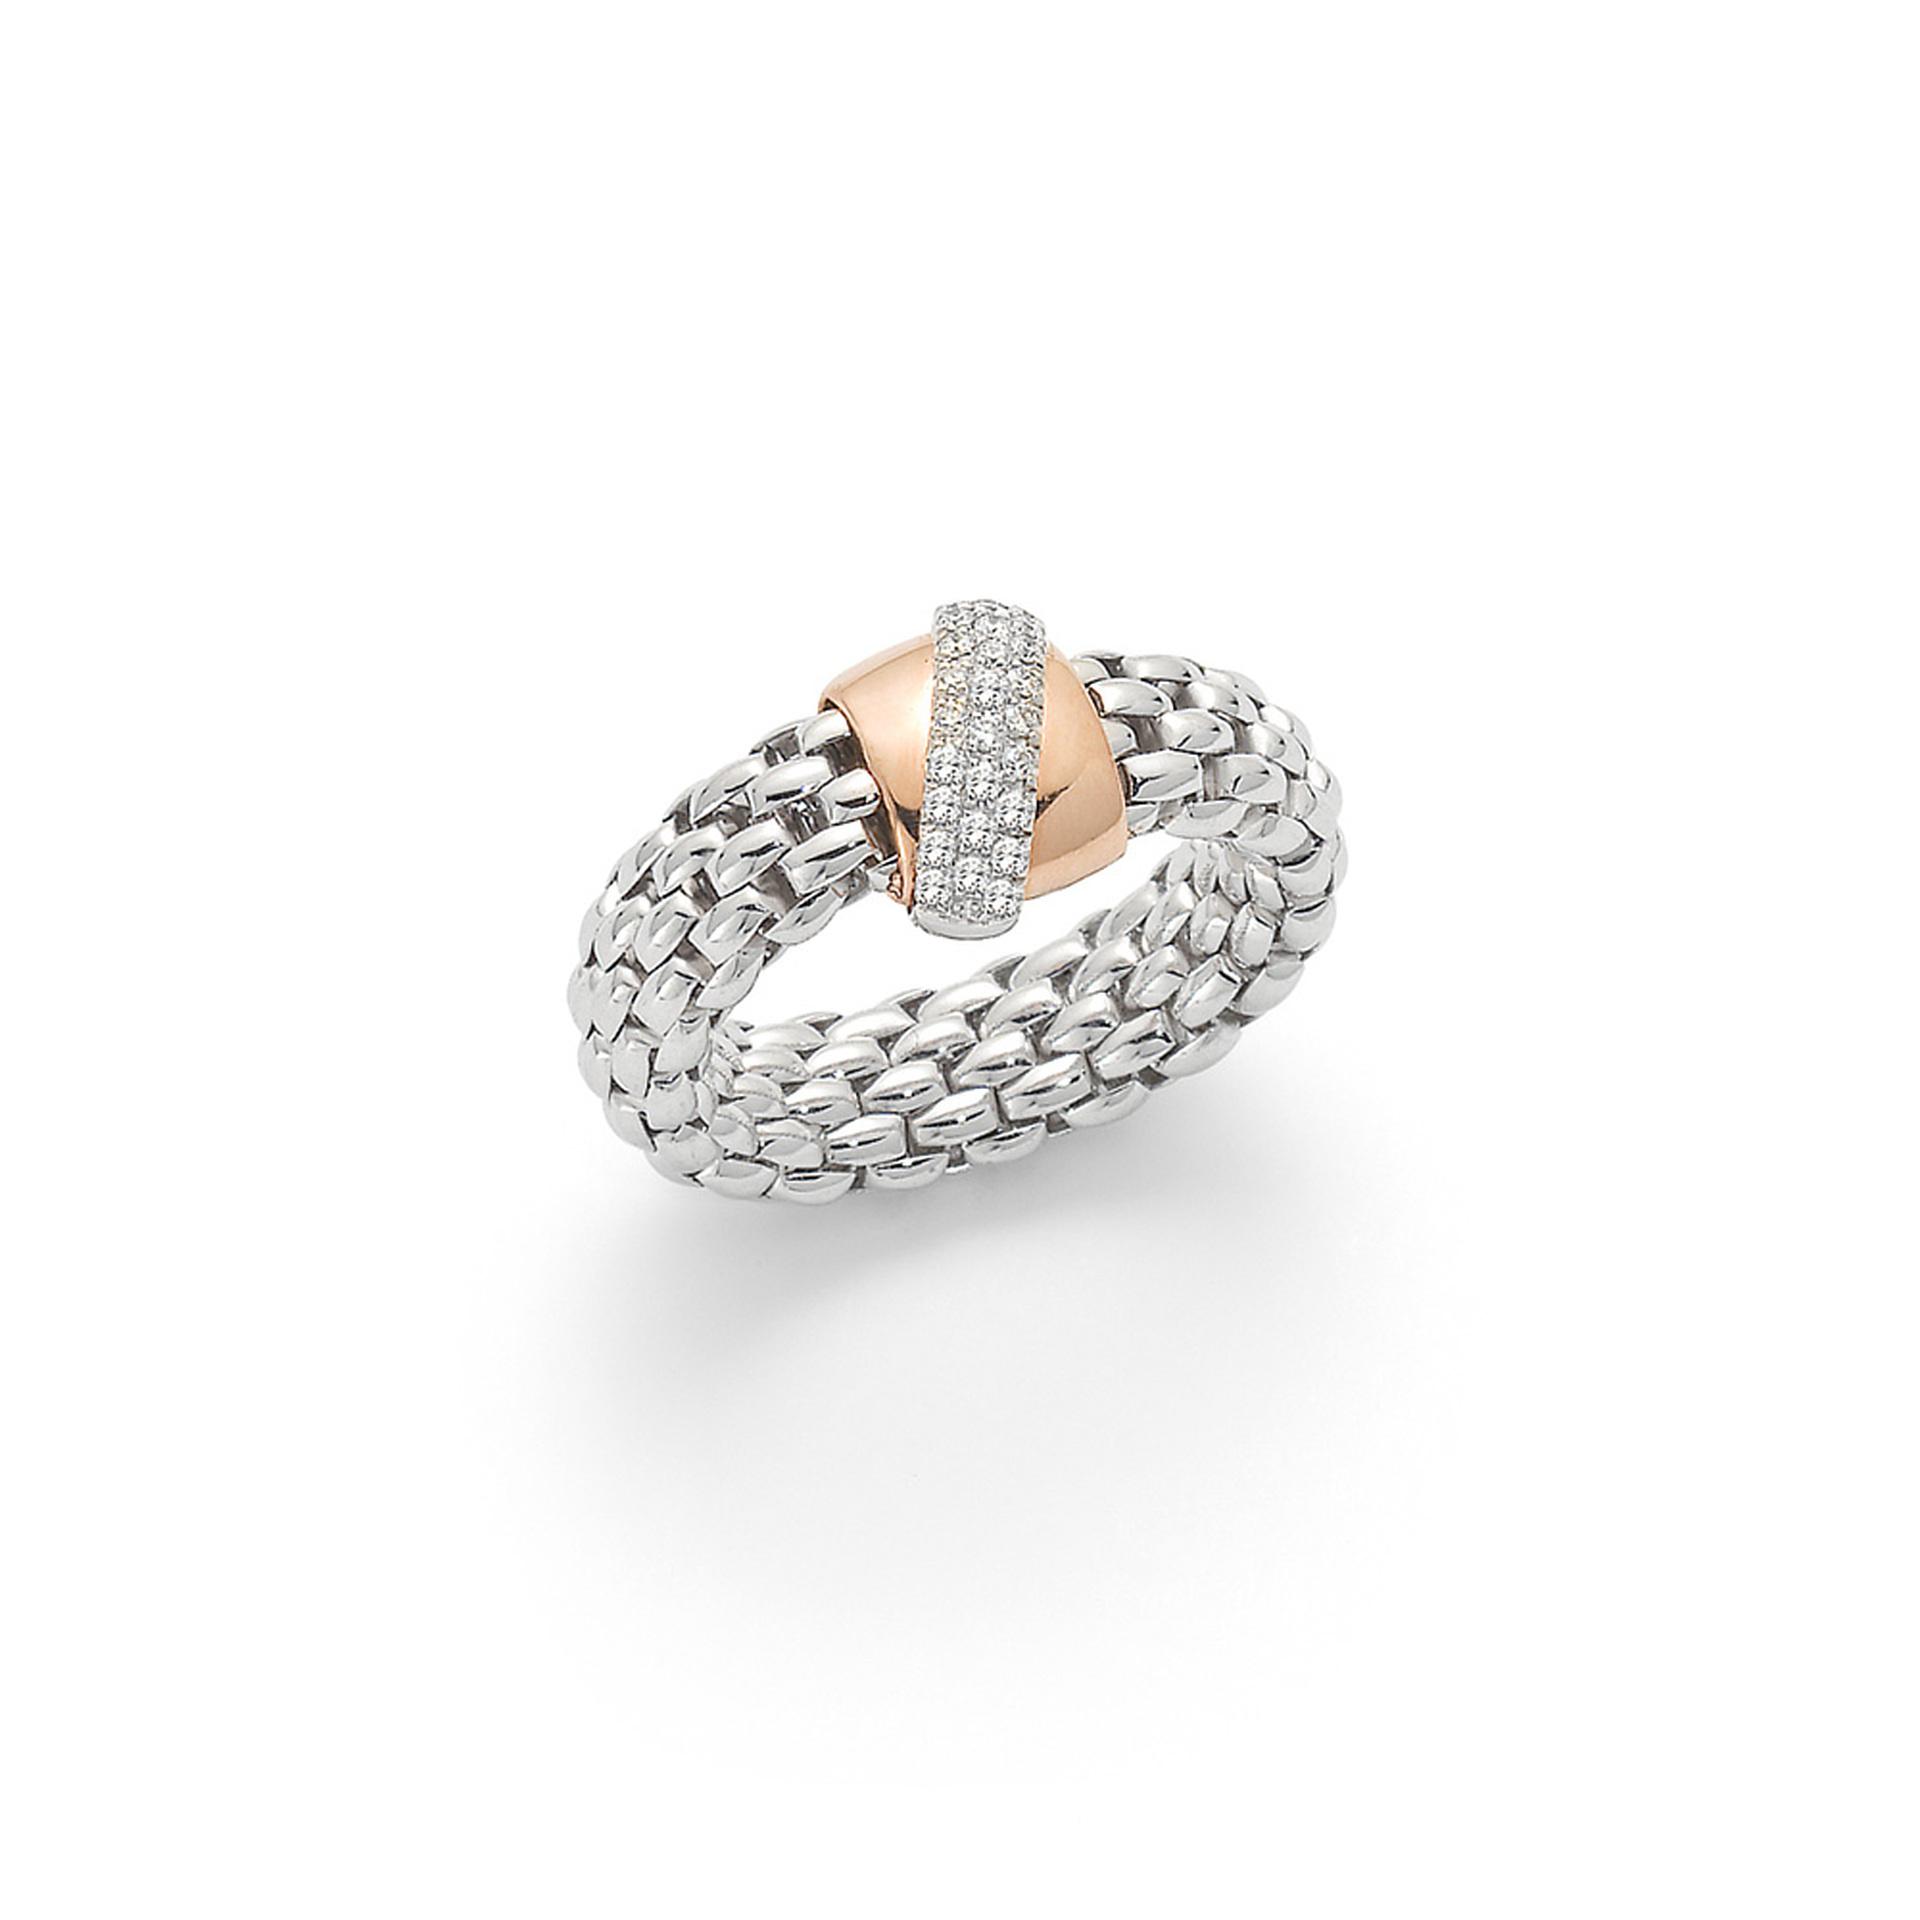 FOPE 18ct White and Rose Gold Flex'it Vendome Diamond Pave Set Ring